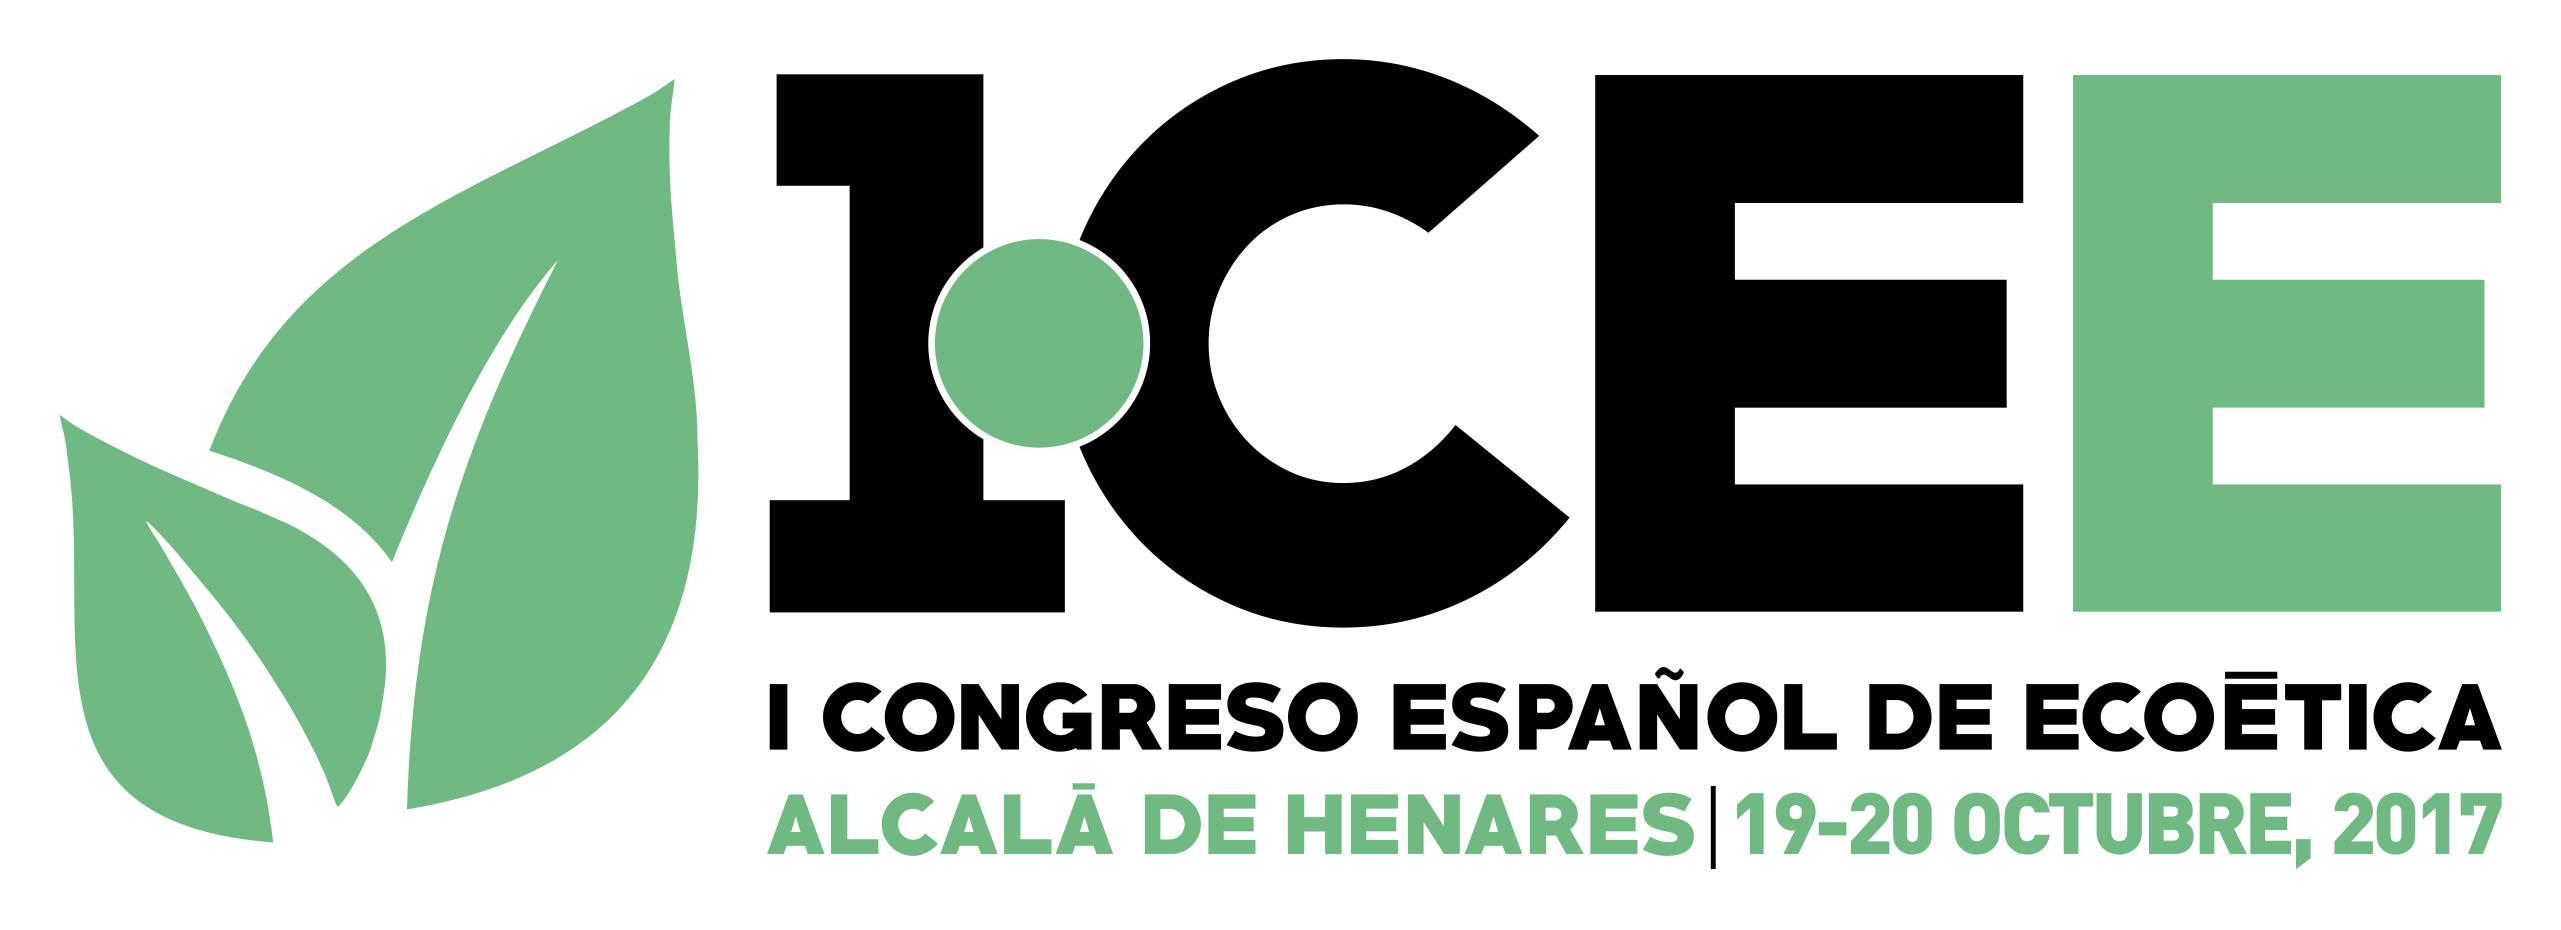 1congreso_español_ecoetica_logo.jpg